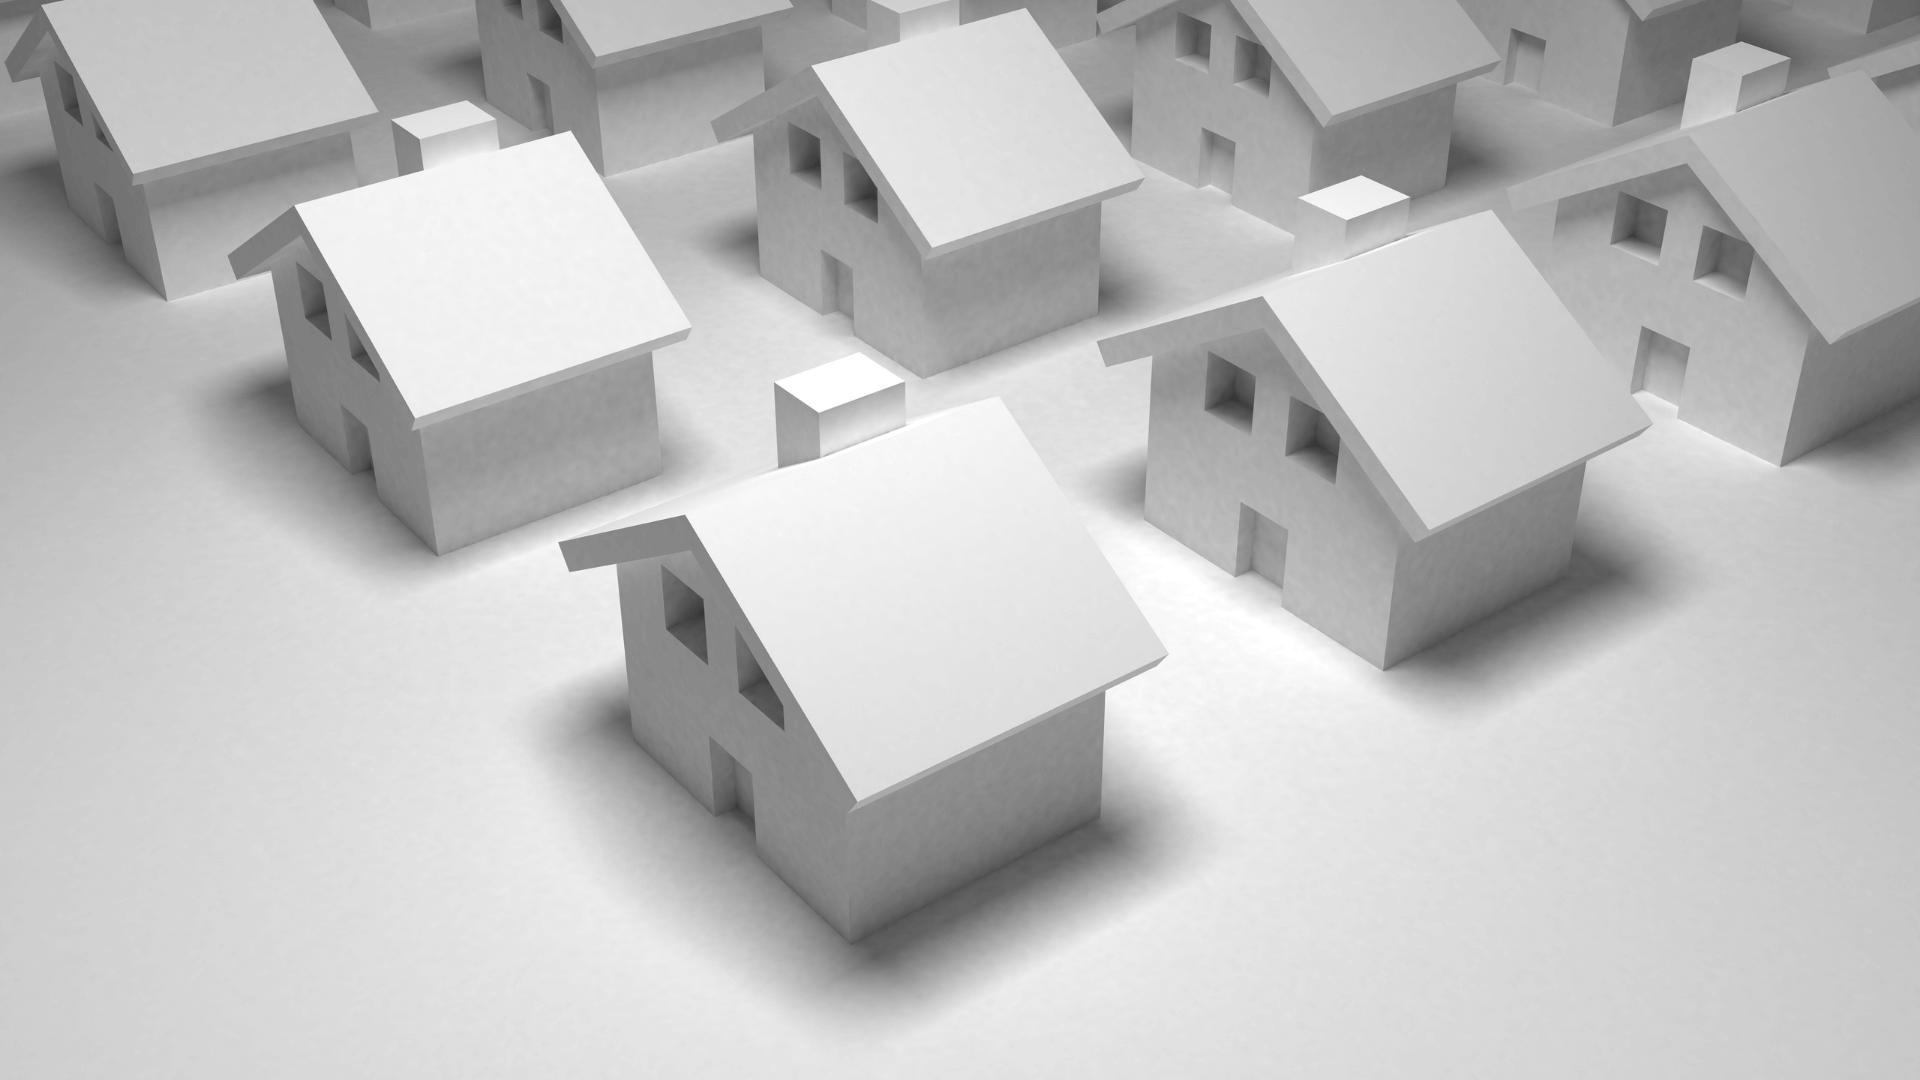 Portfolio Management of rental properties that letting agents offer landlords